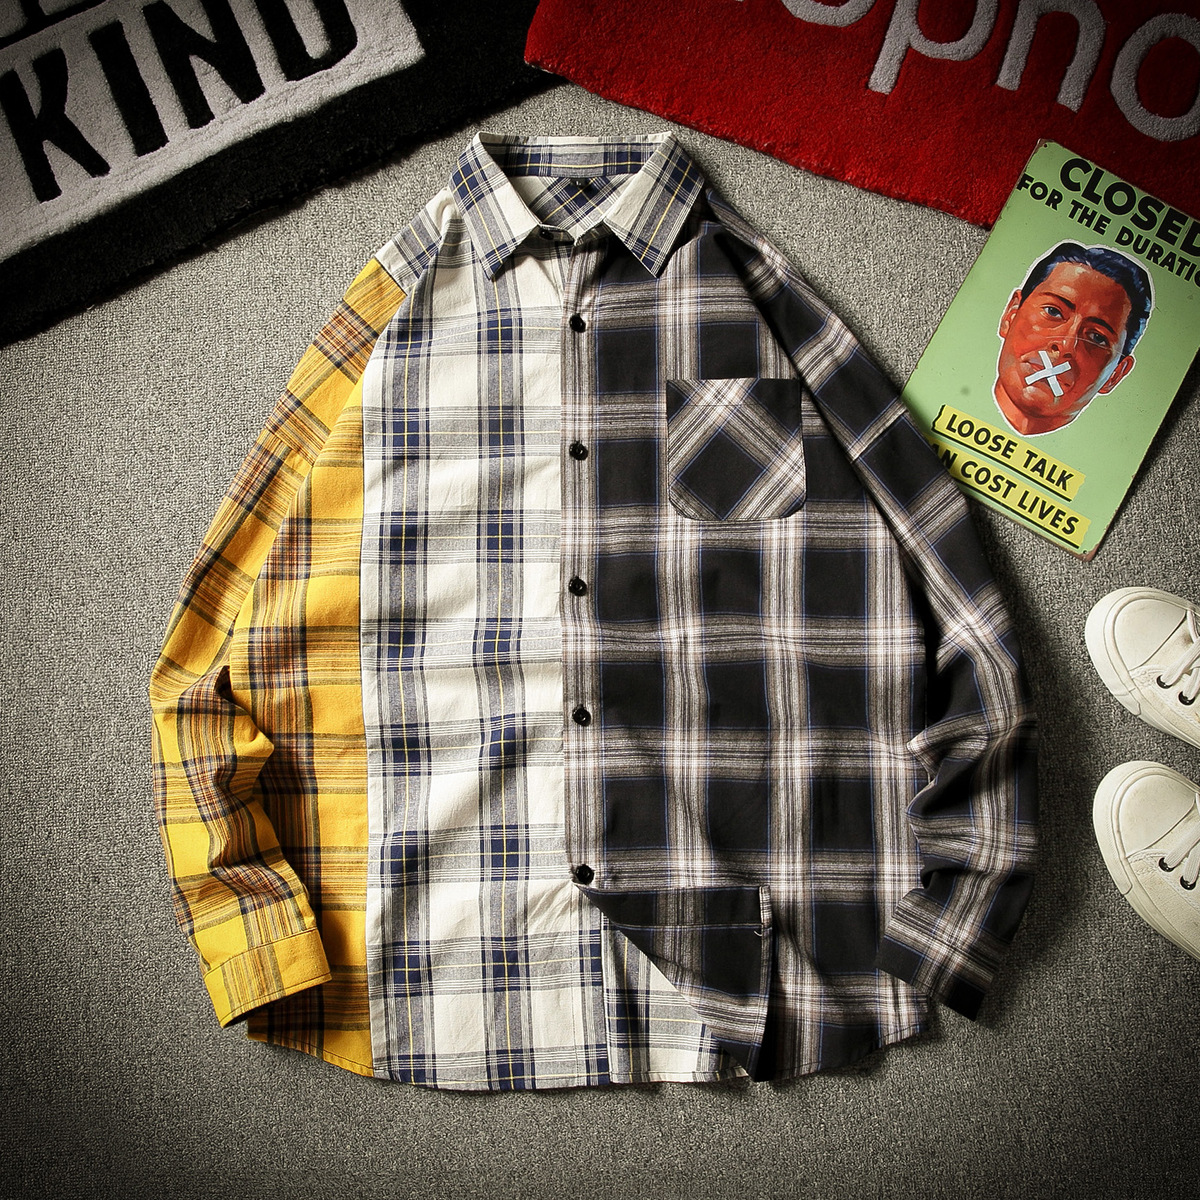 New Kpop Bangtan Boy SUGA Same Unisex Fashion Plaid Blouse Sweatshirt Korean Style Pocket Multicolor Lightweight Shirts